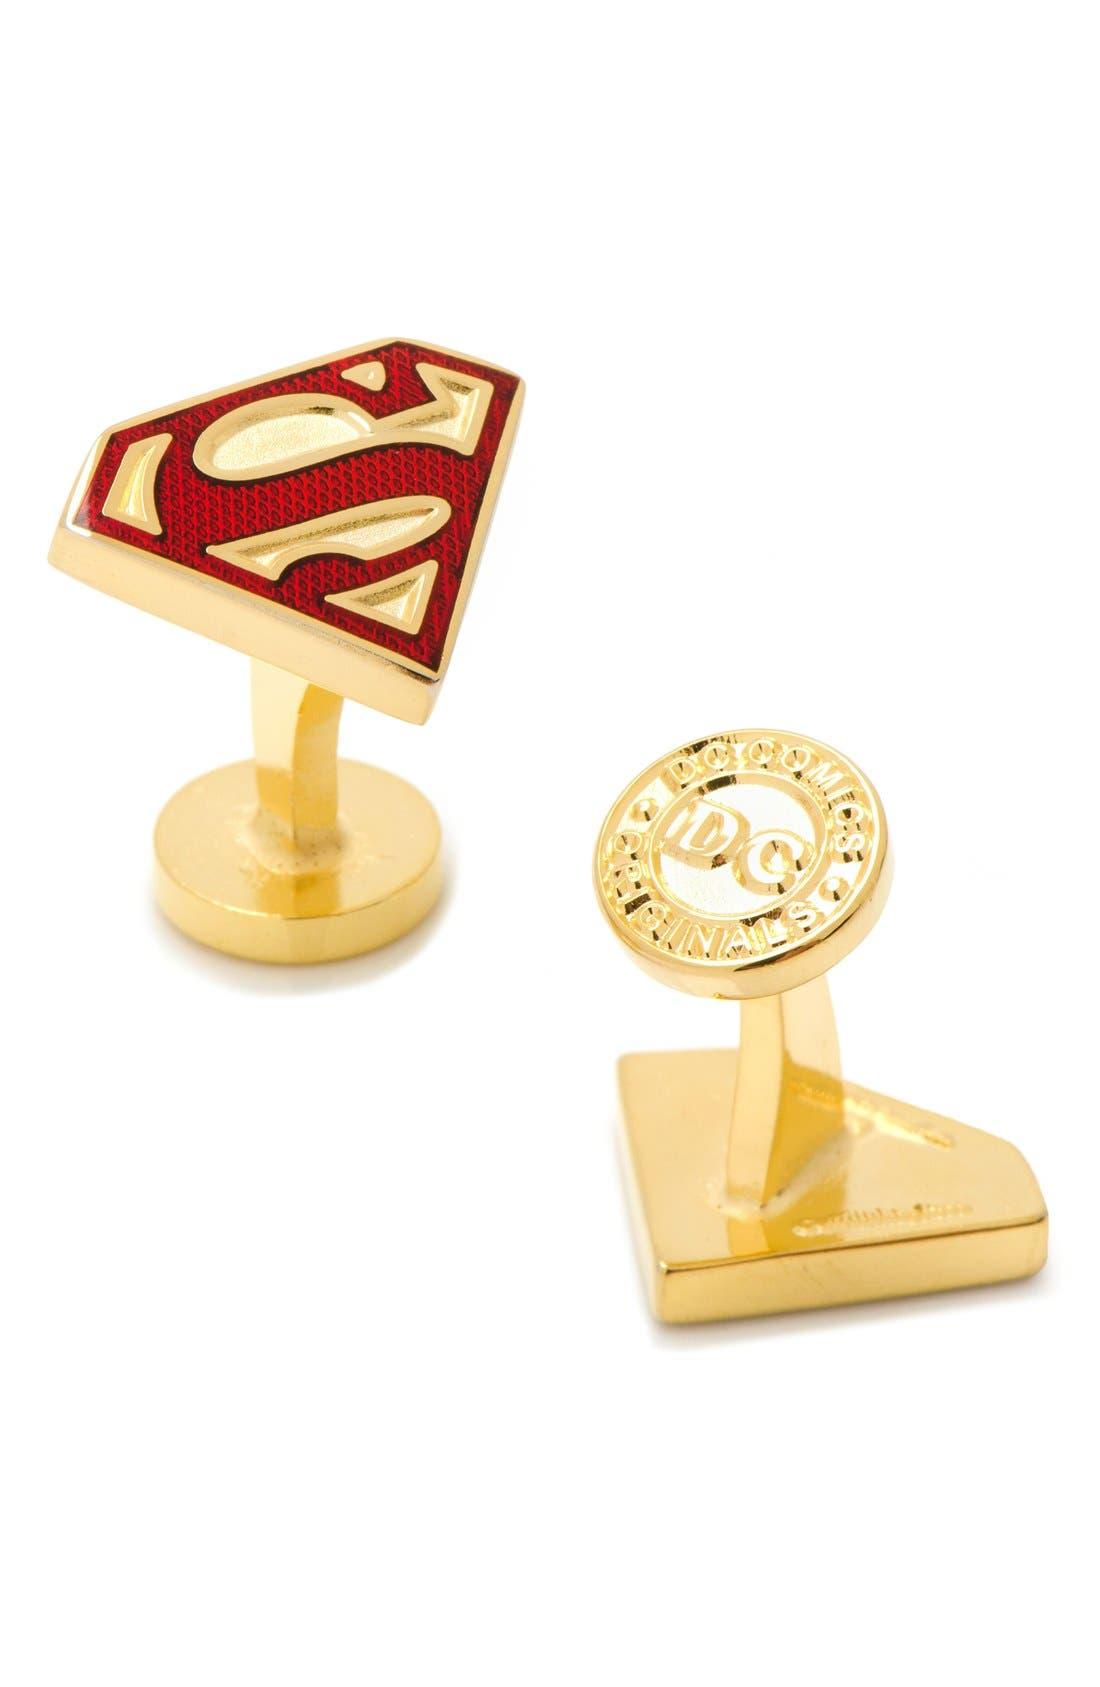 'Superman Shield' Cuff Links,                             Main thumbnail 1, color,                             GOLD